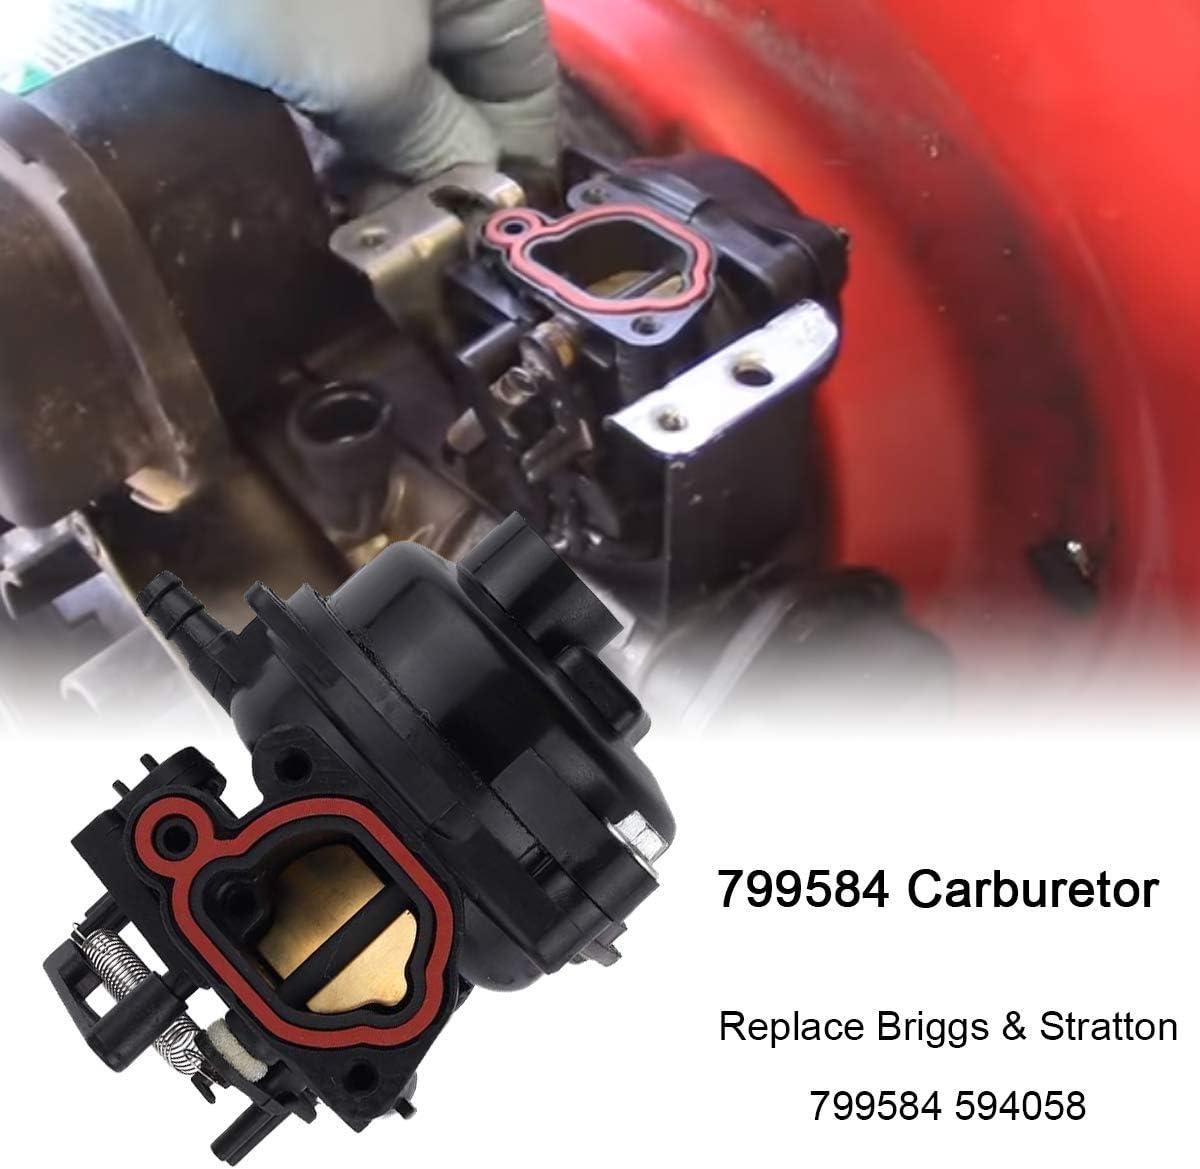 N//C ZAMDOE 799584 Carburetor Accessories Fits Troy Bilt TB200 TB110 TB554 Lawnmower 675EX 140cc Engines Briggs /& Stratton 799584 594058 550EX 725EXI 625EX